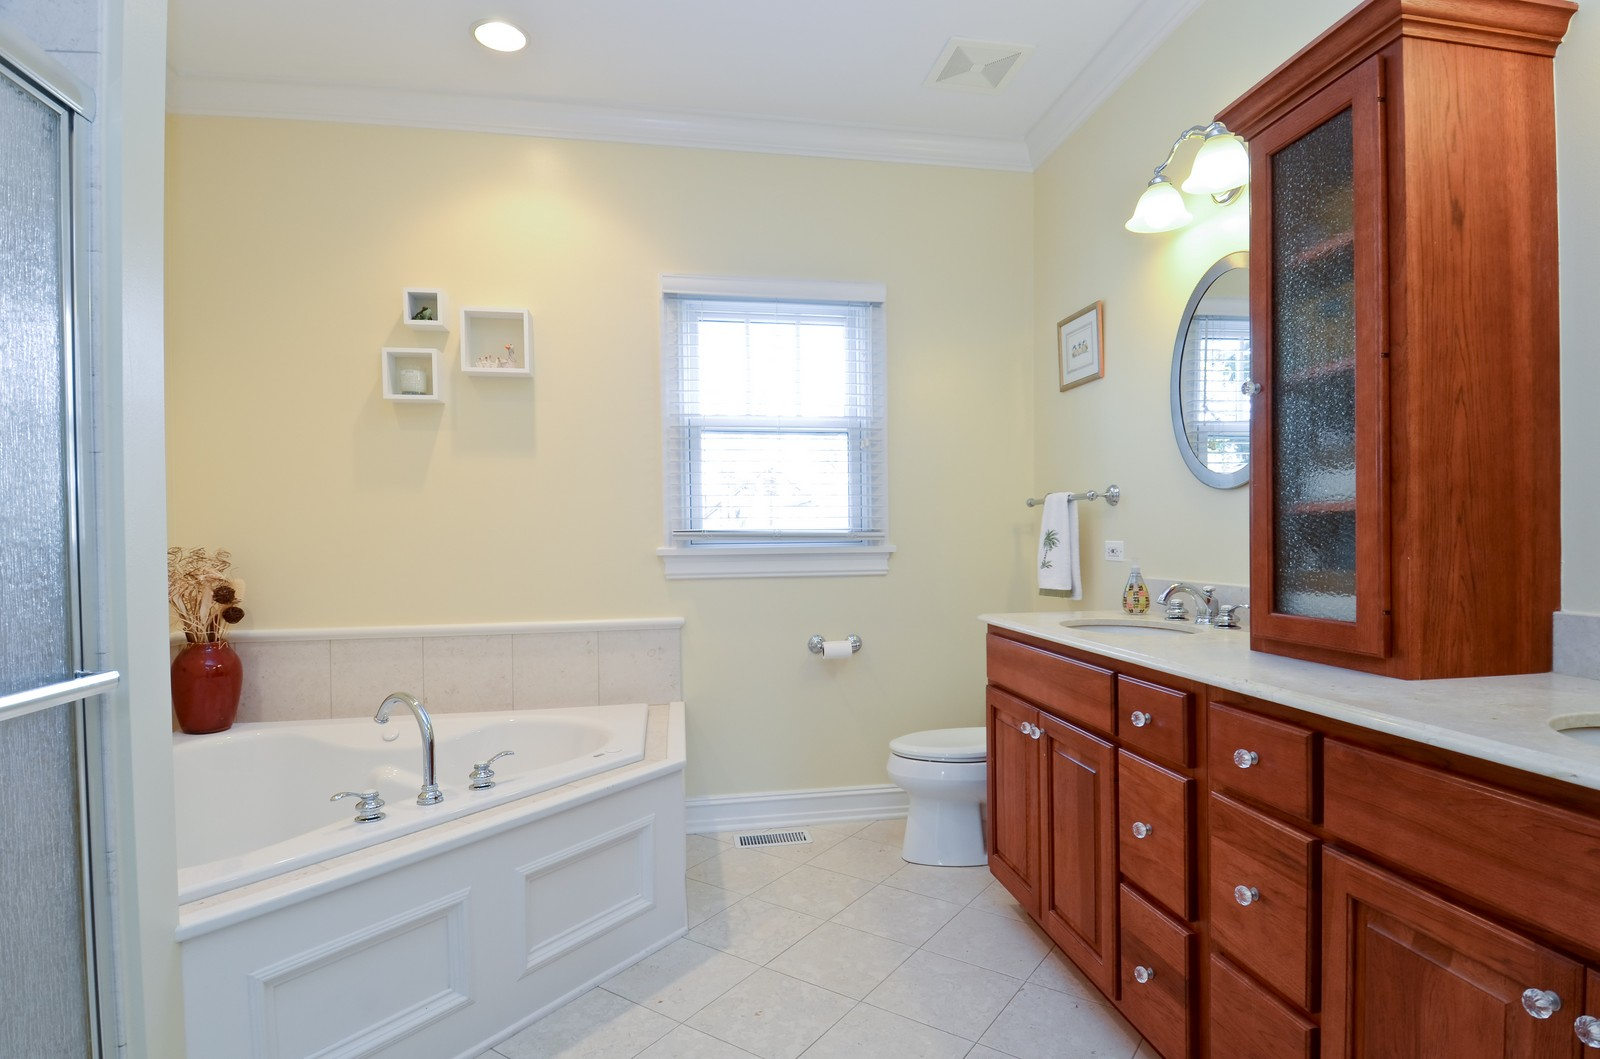 Real Estate Photography - 738 Western Ave., Glen Ellyn, IL, 60137 - Master Bathroom